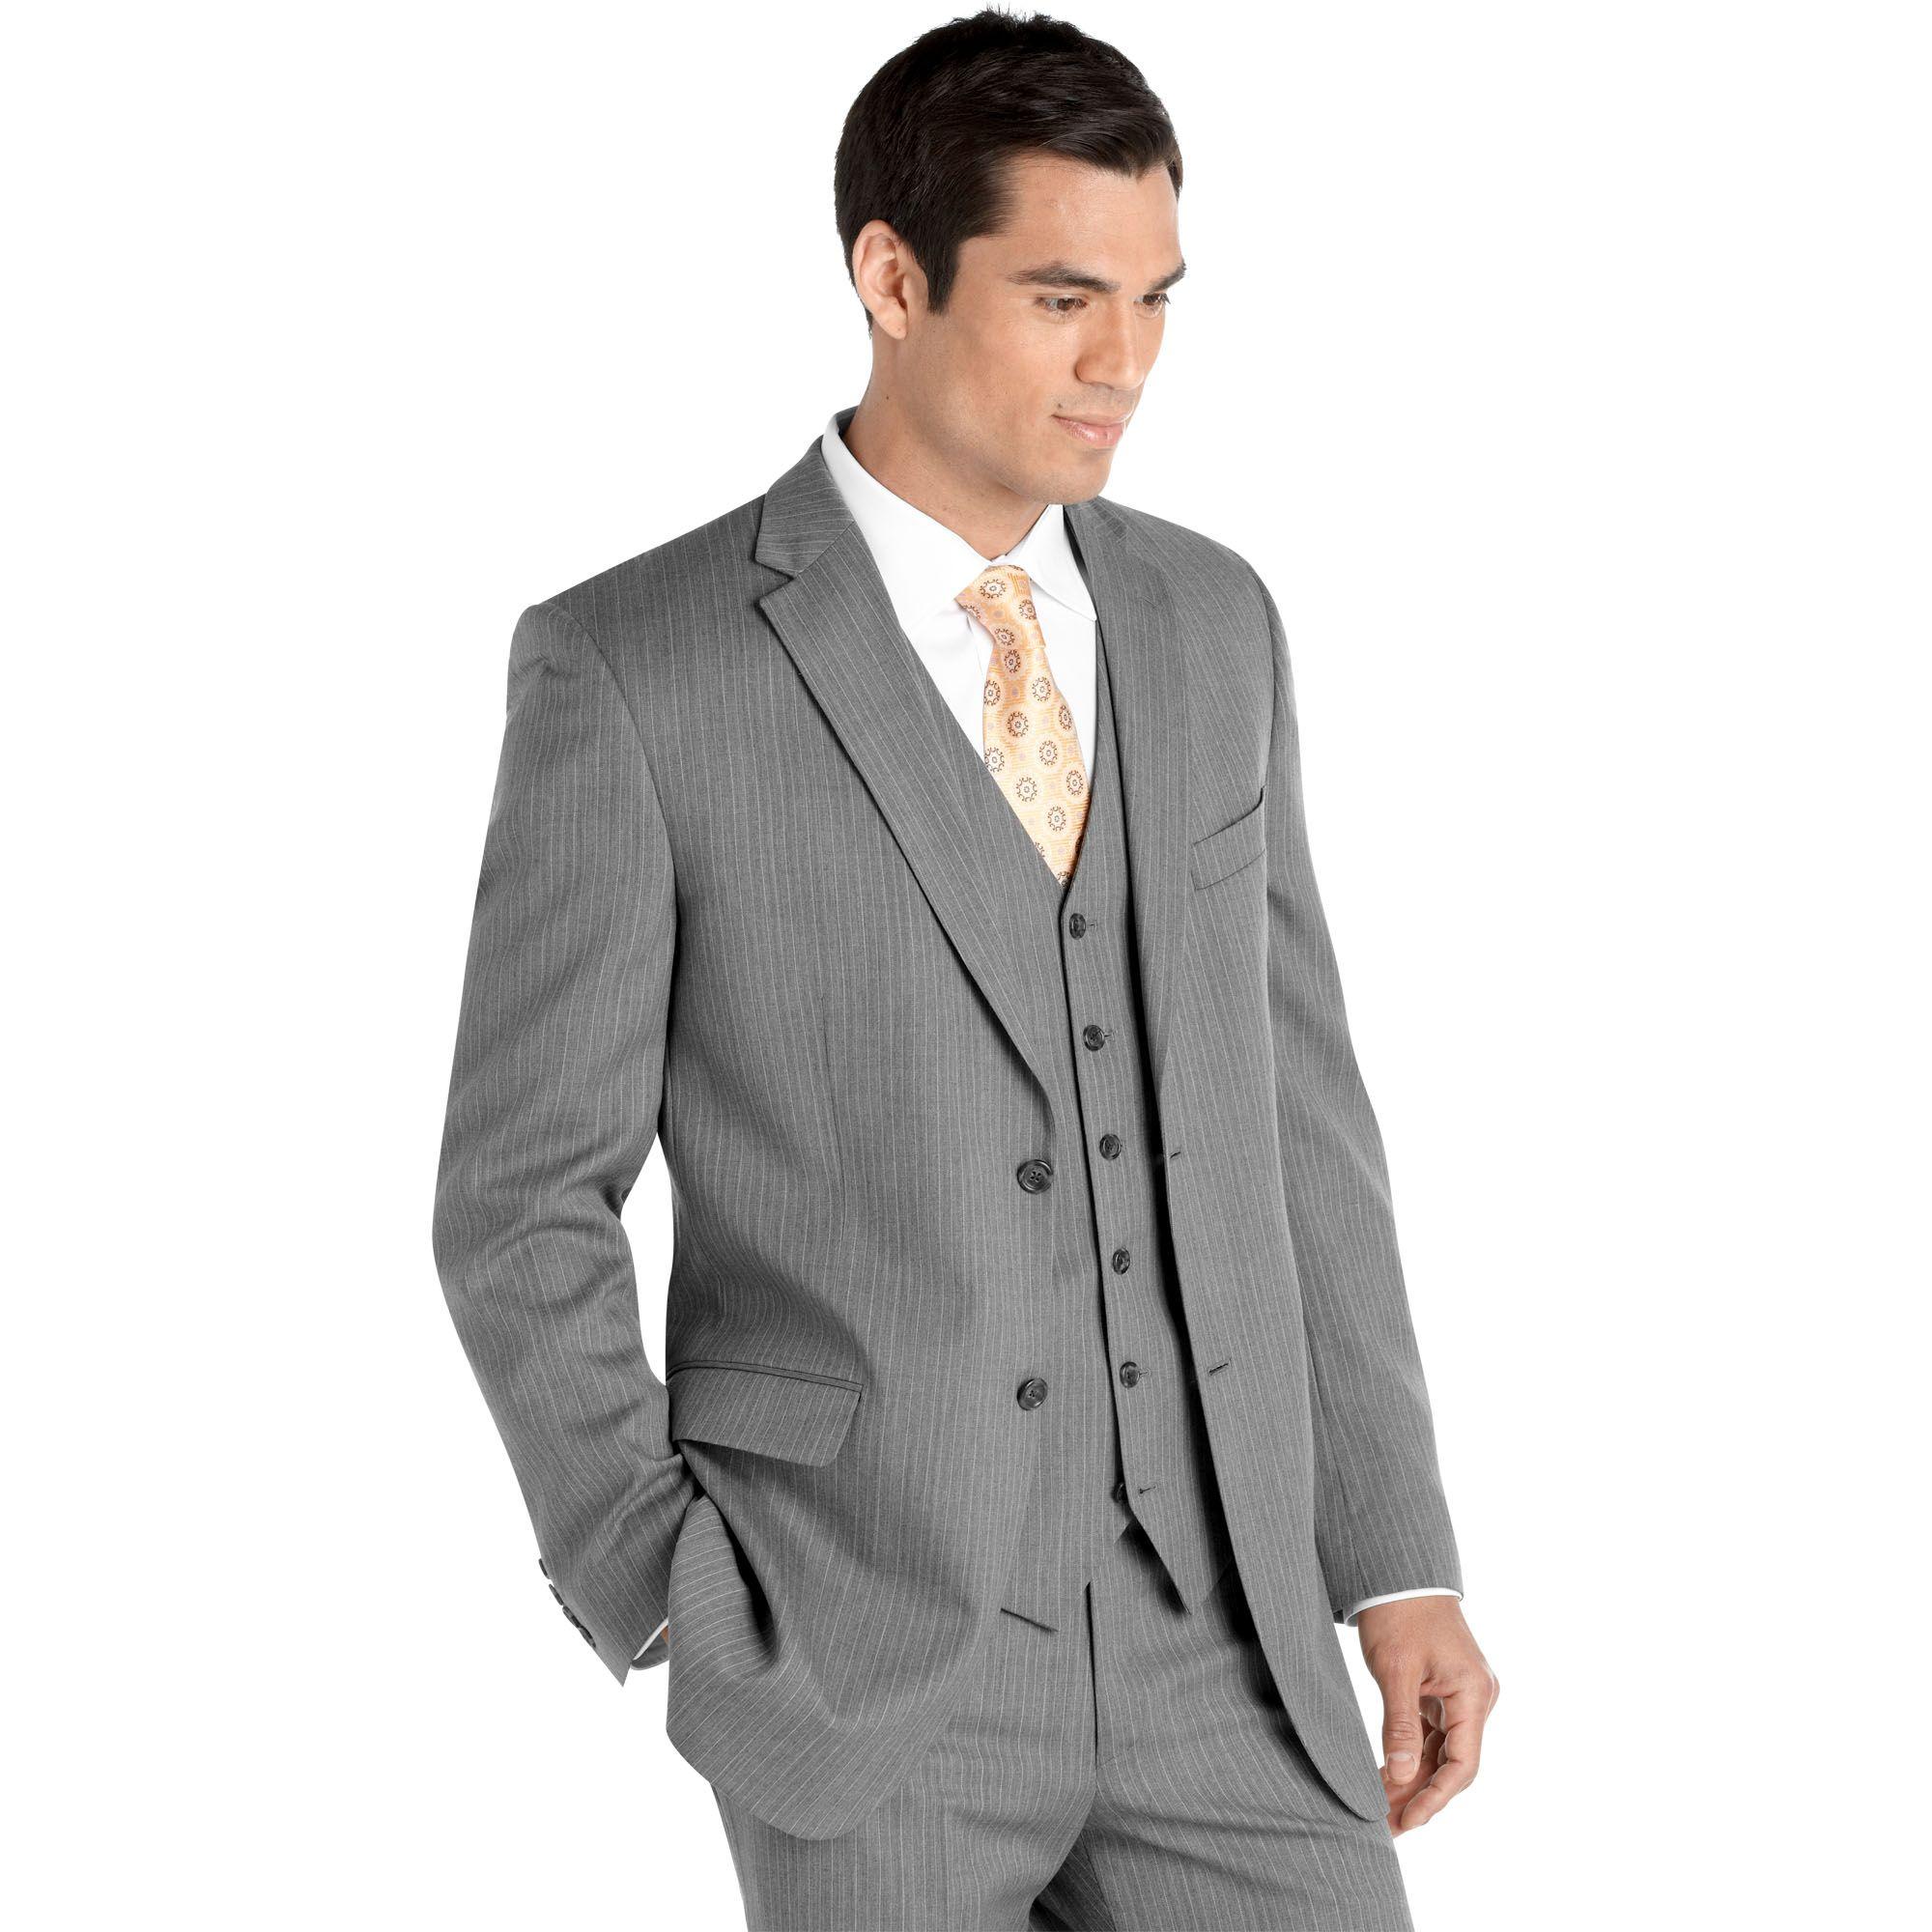 Gray pinstripe, notch lapel, 3 piece Shop mens clothing